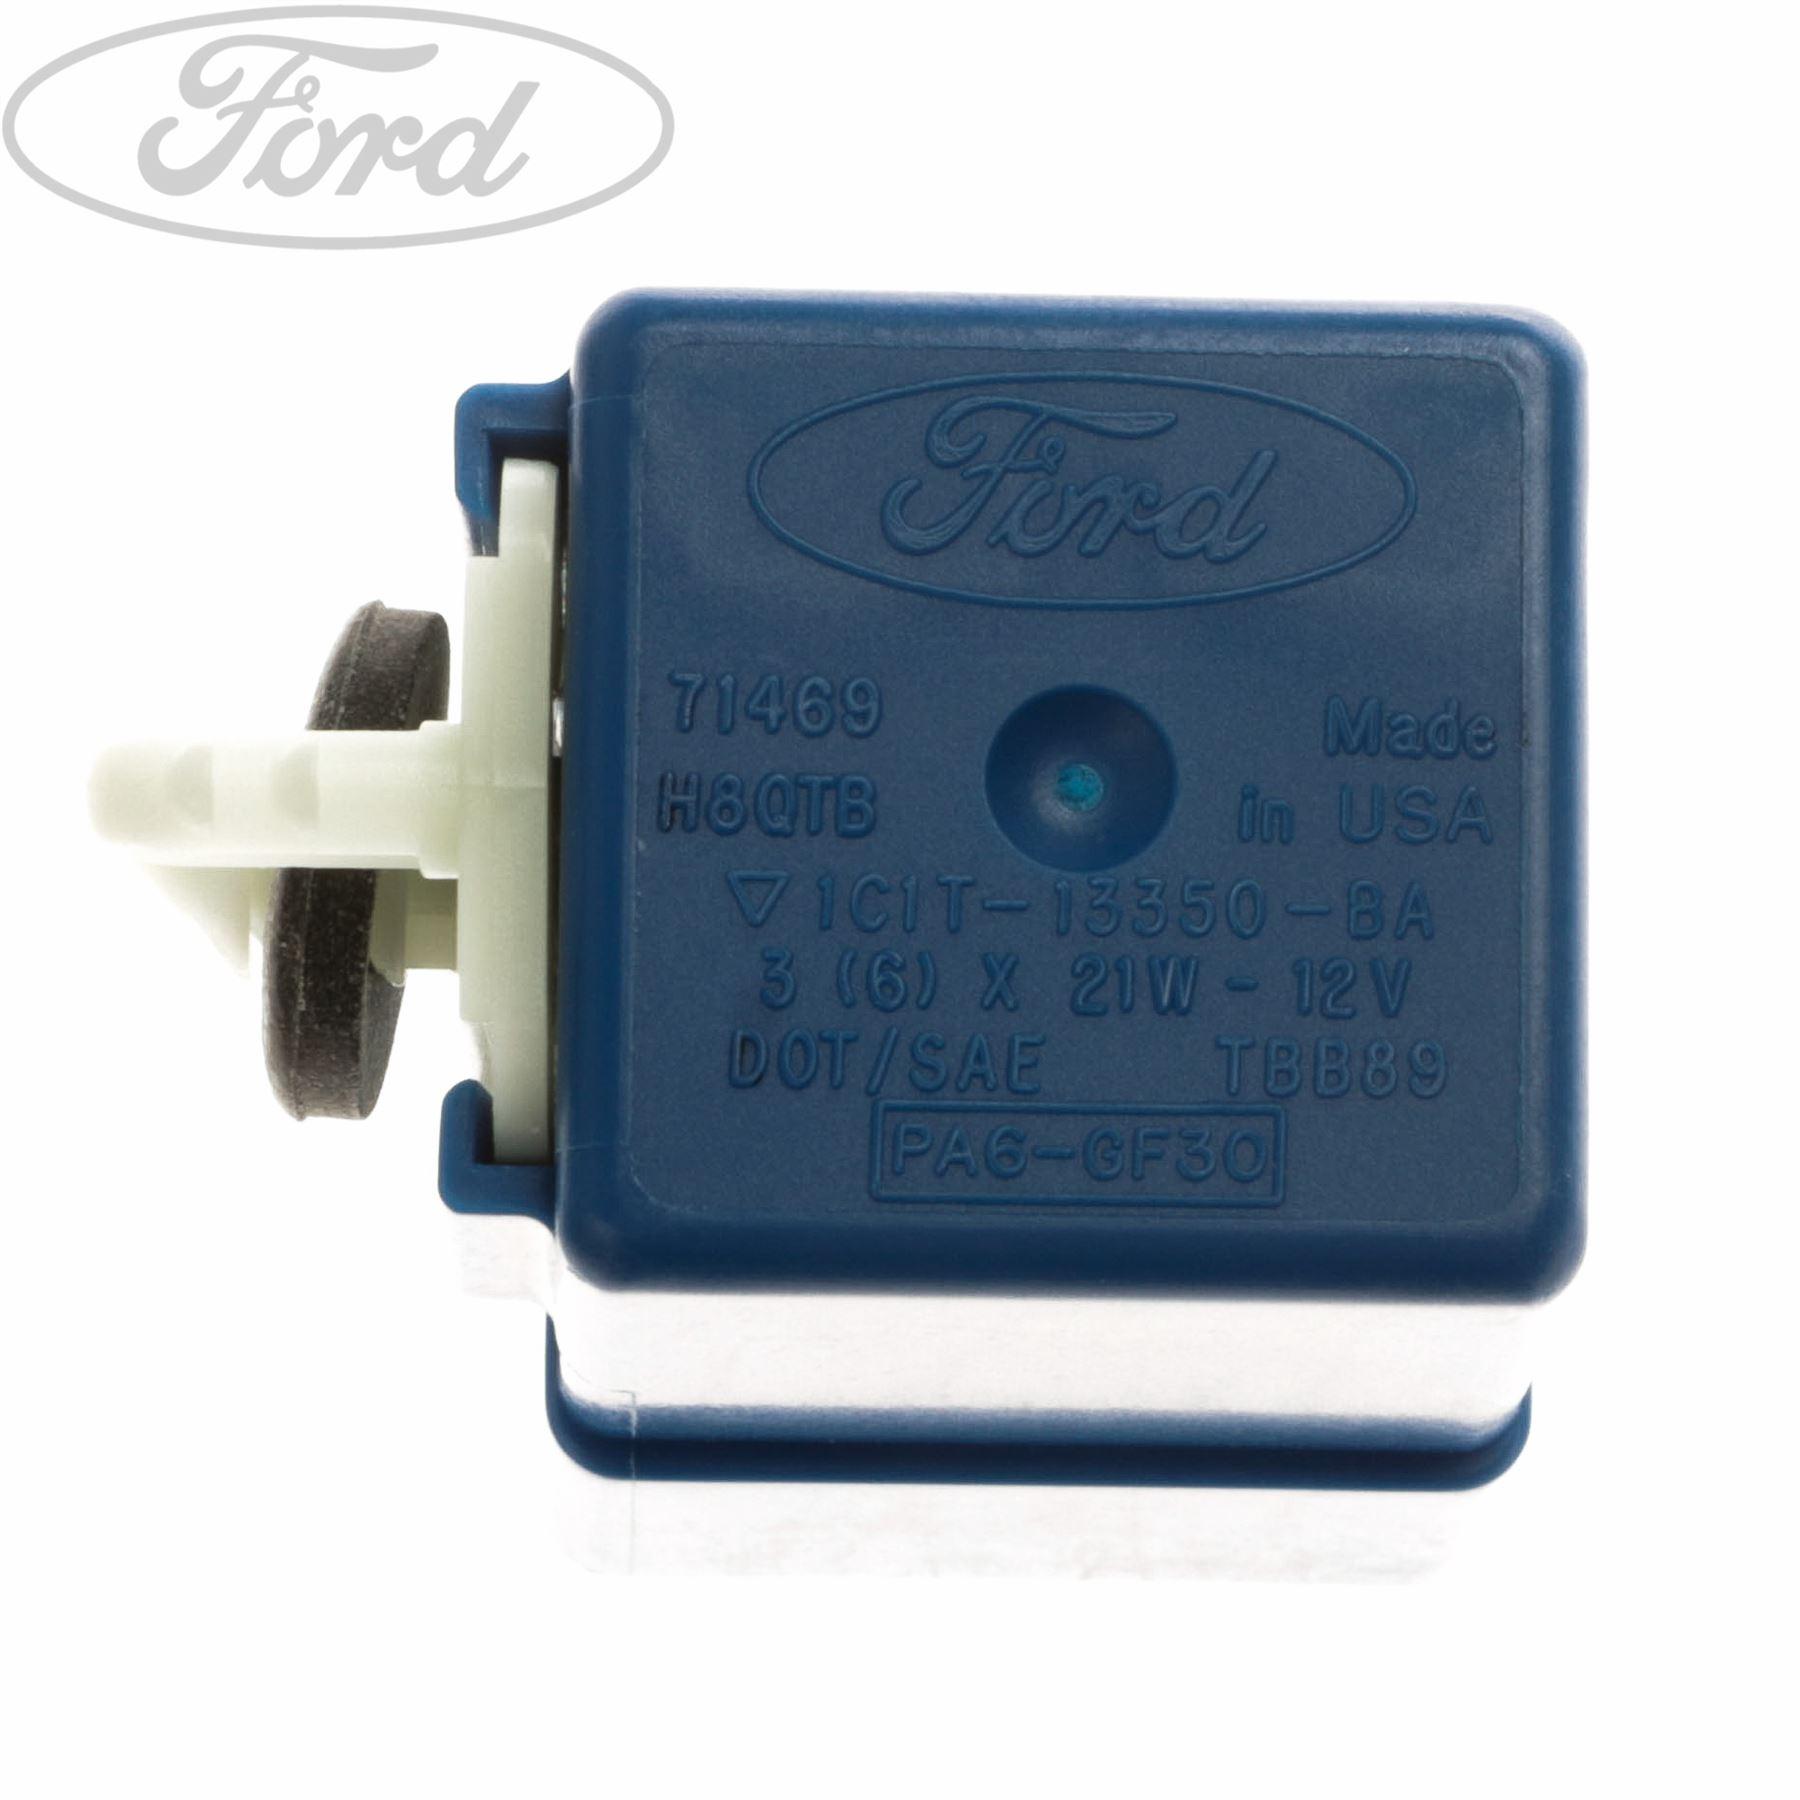 Genuine Ford Transit Mk6 Indicator Hazard Flasher Relay 3 6 X 21w Fuse Box 4330629